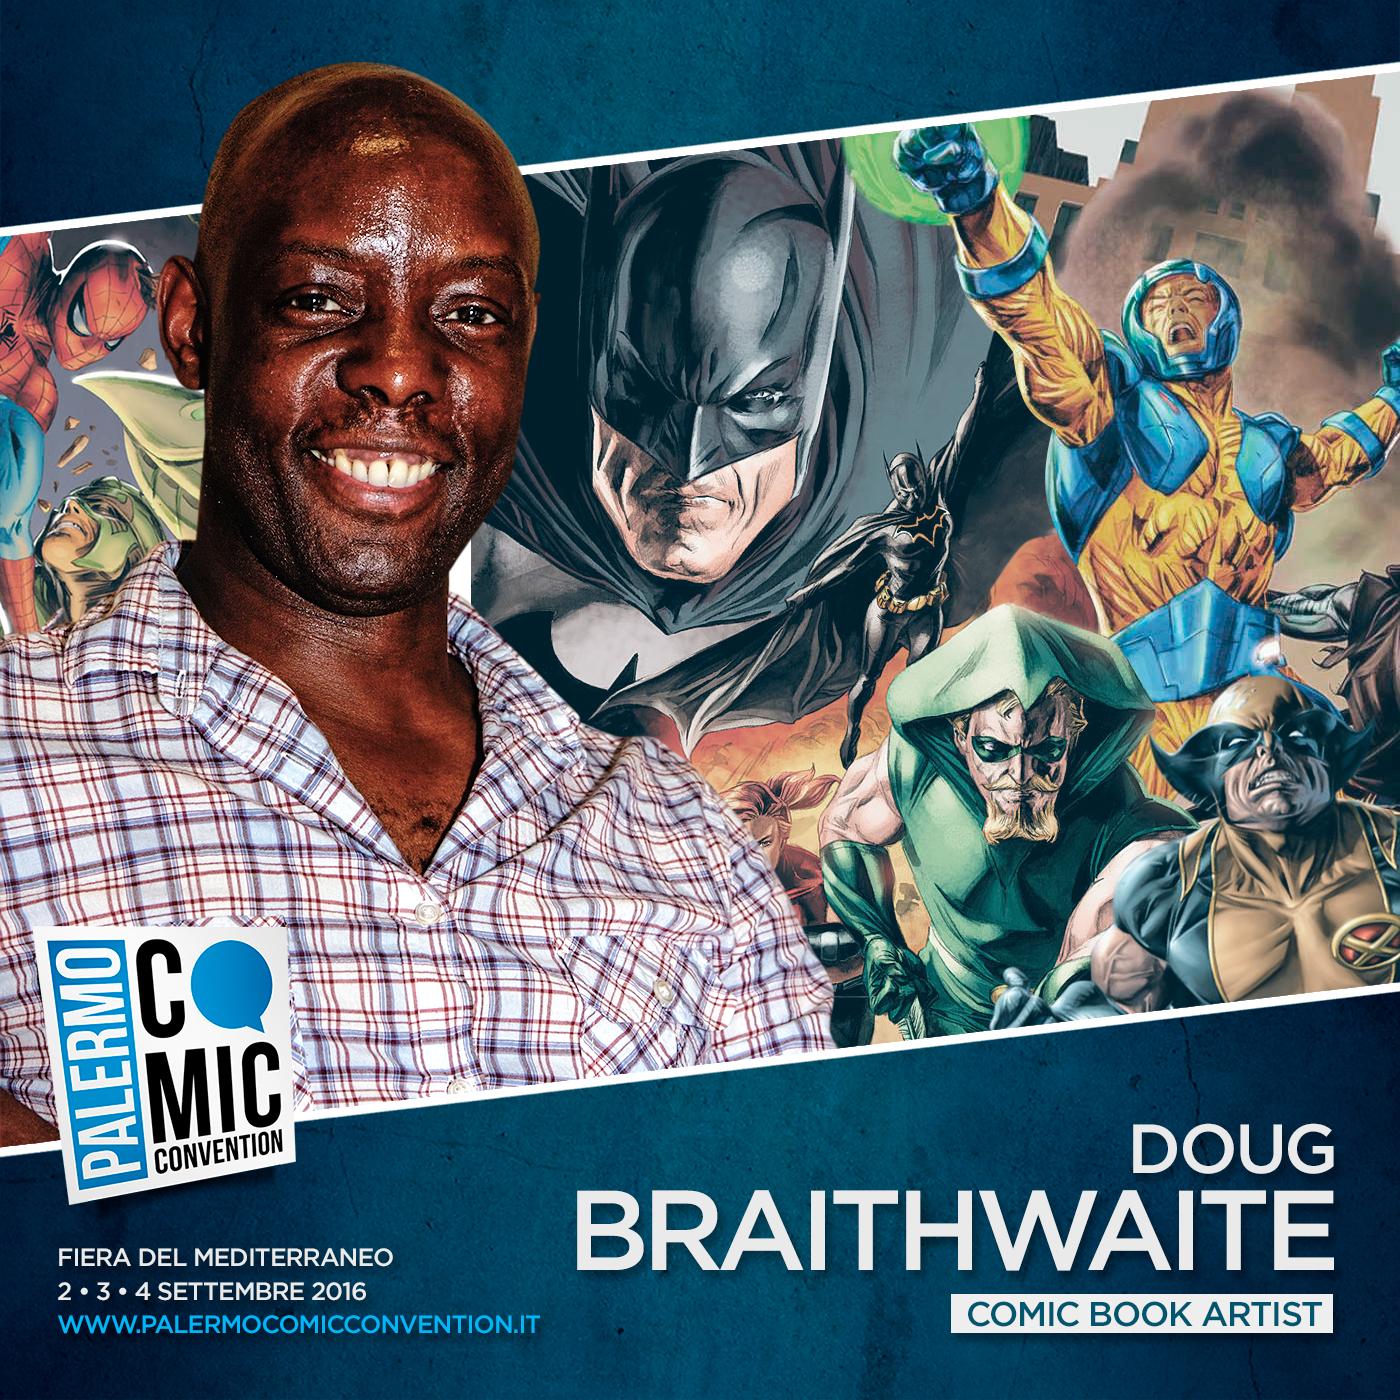 Doug Braithwaite